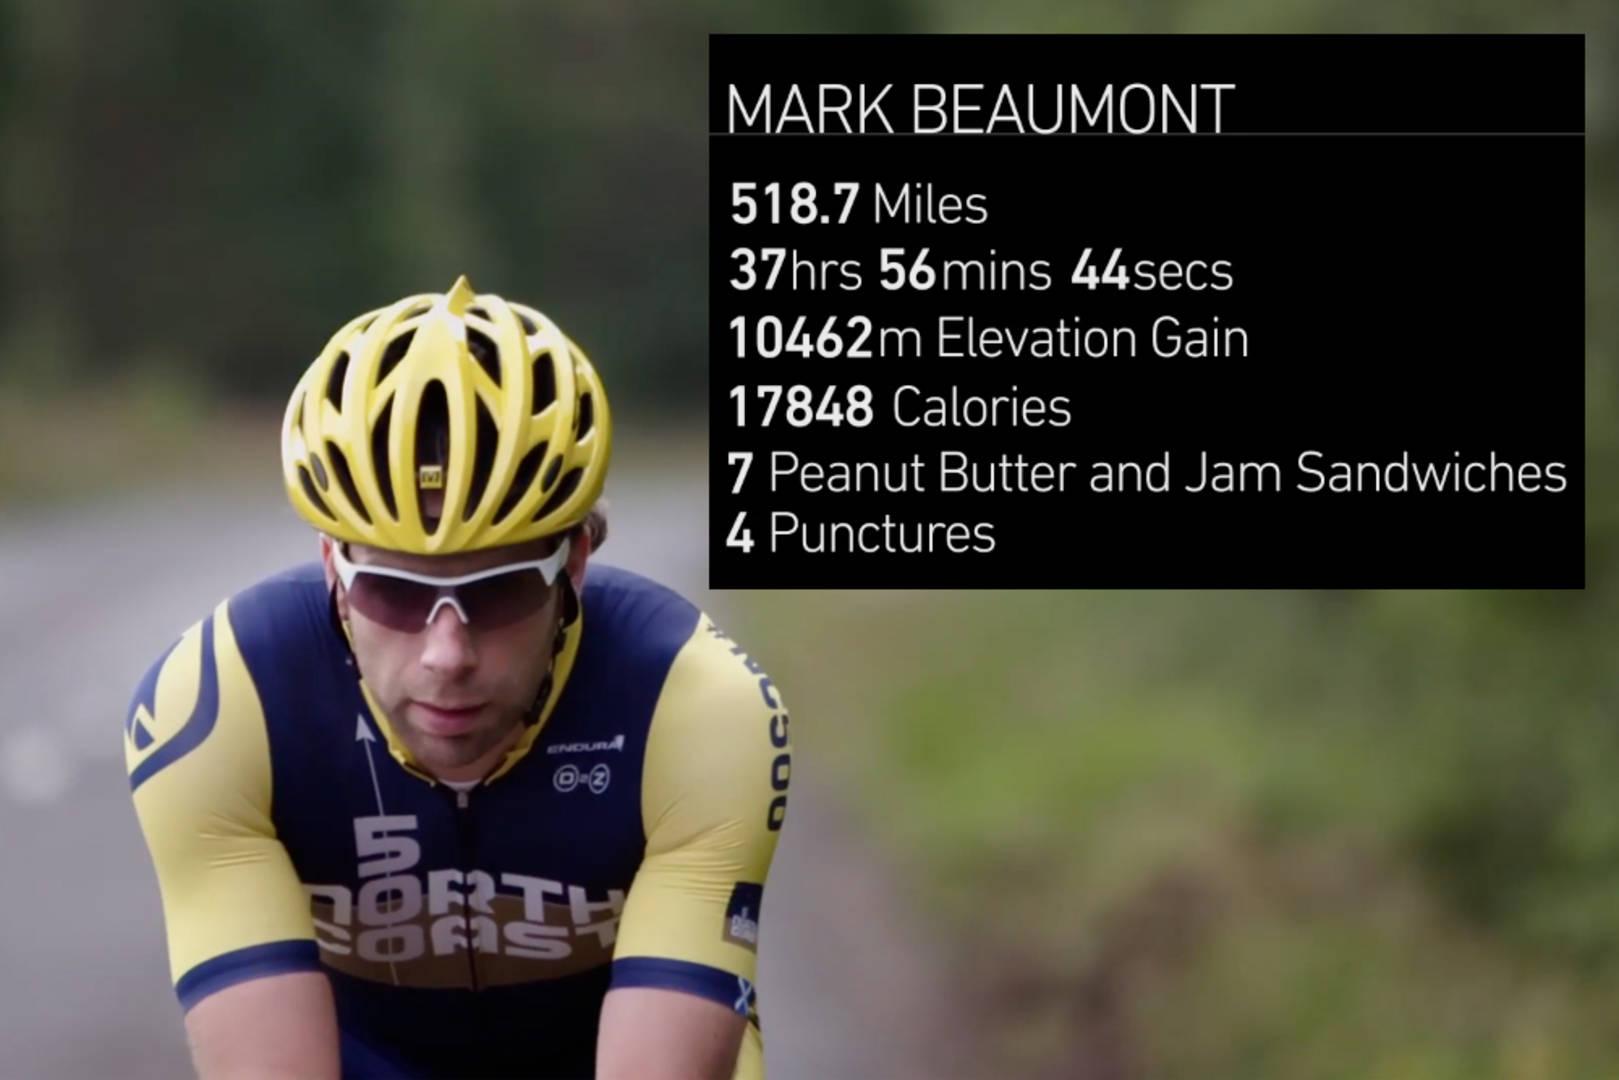 Mark_Beaumont gyos skotias road (3)